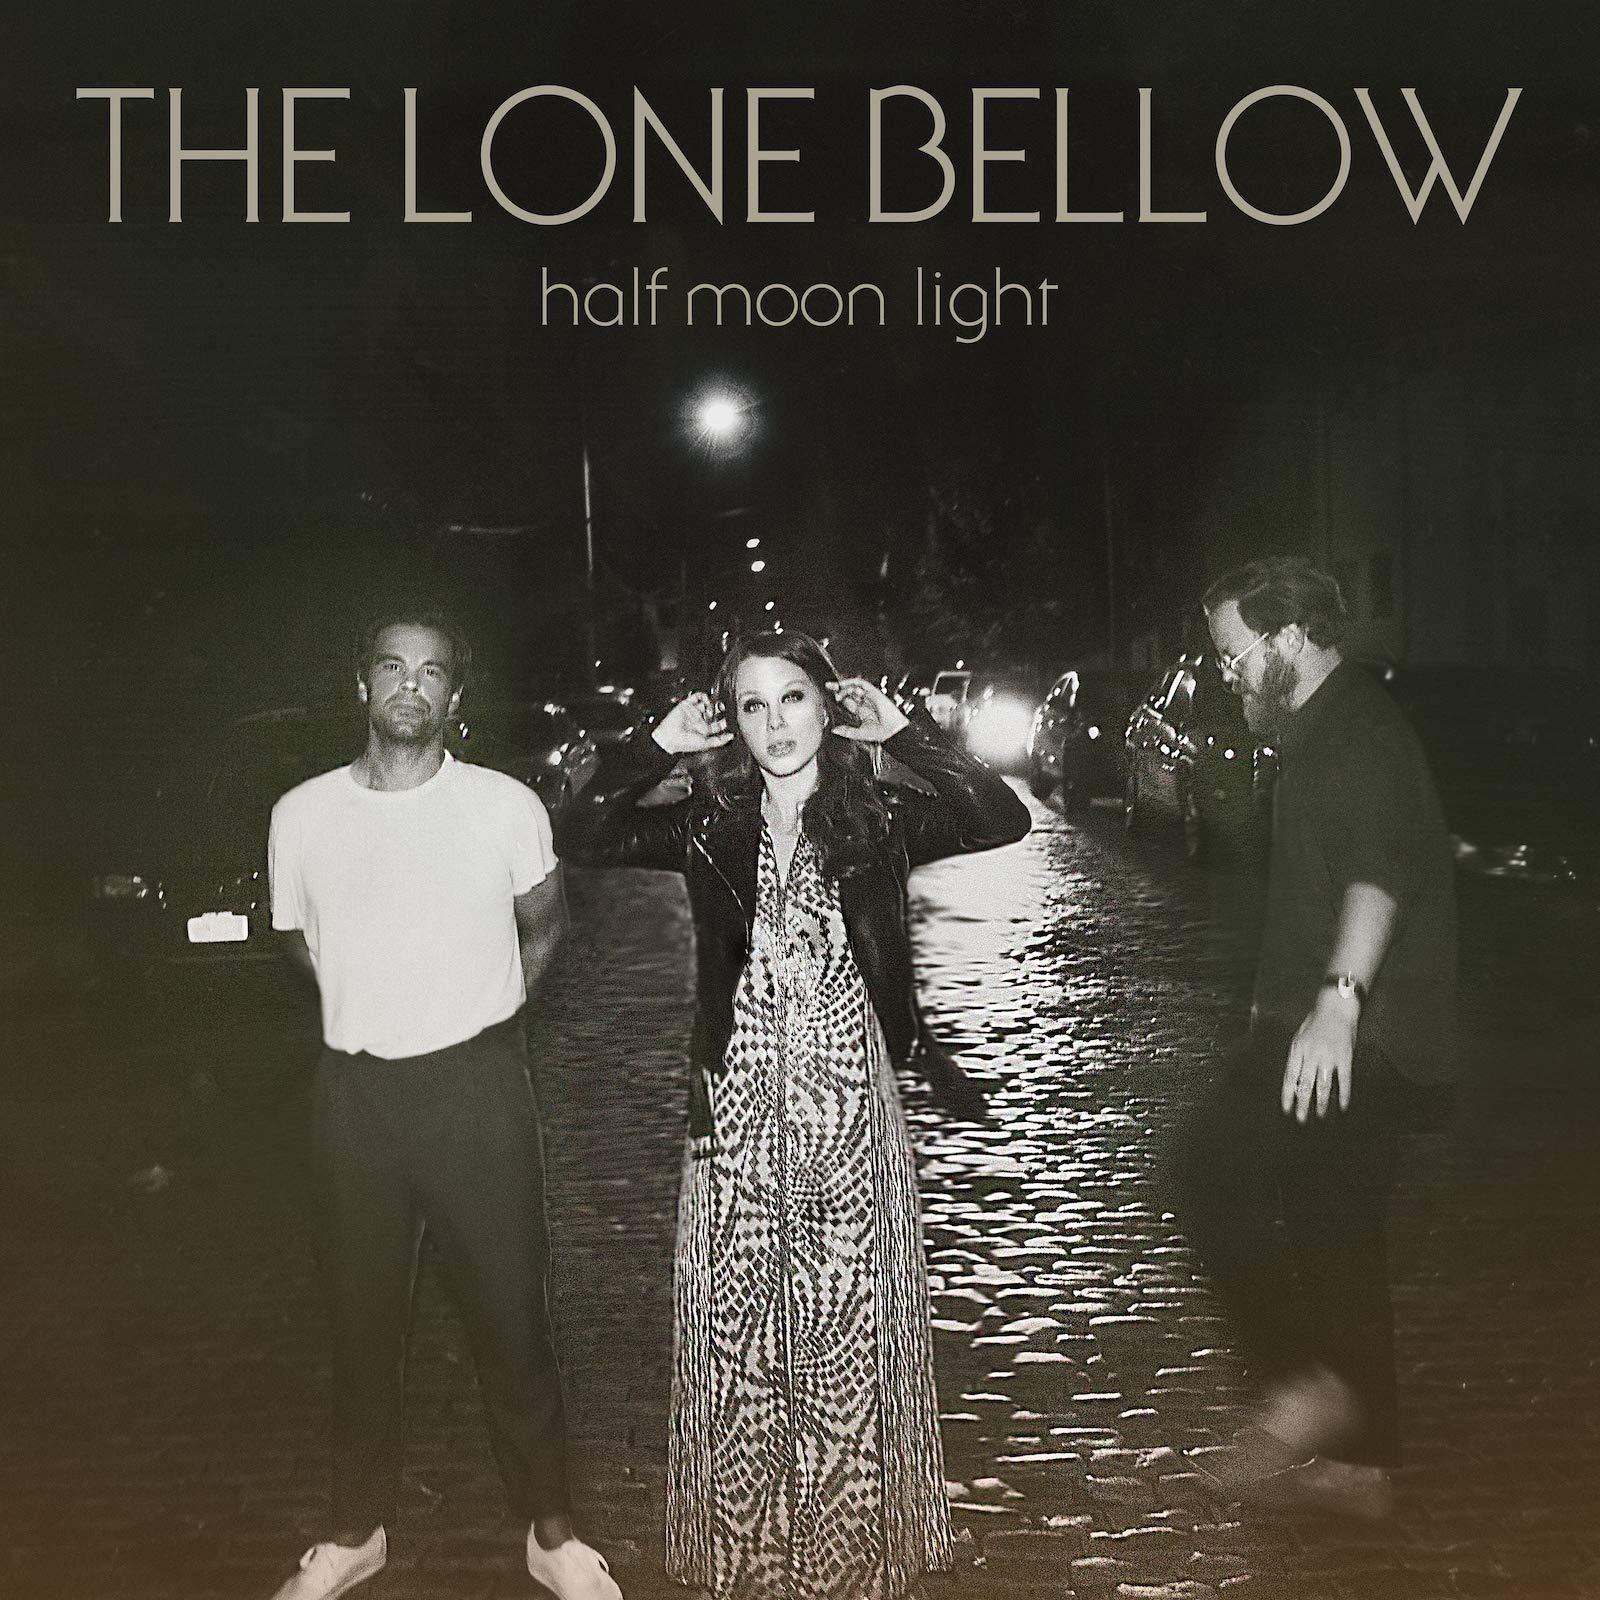 The Lone Bellow – Half Moon Light (2020) [FLAC]